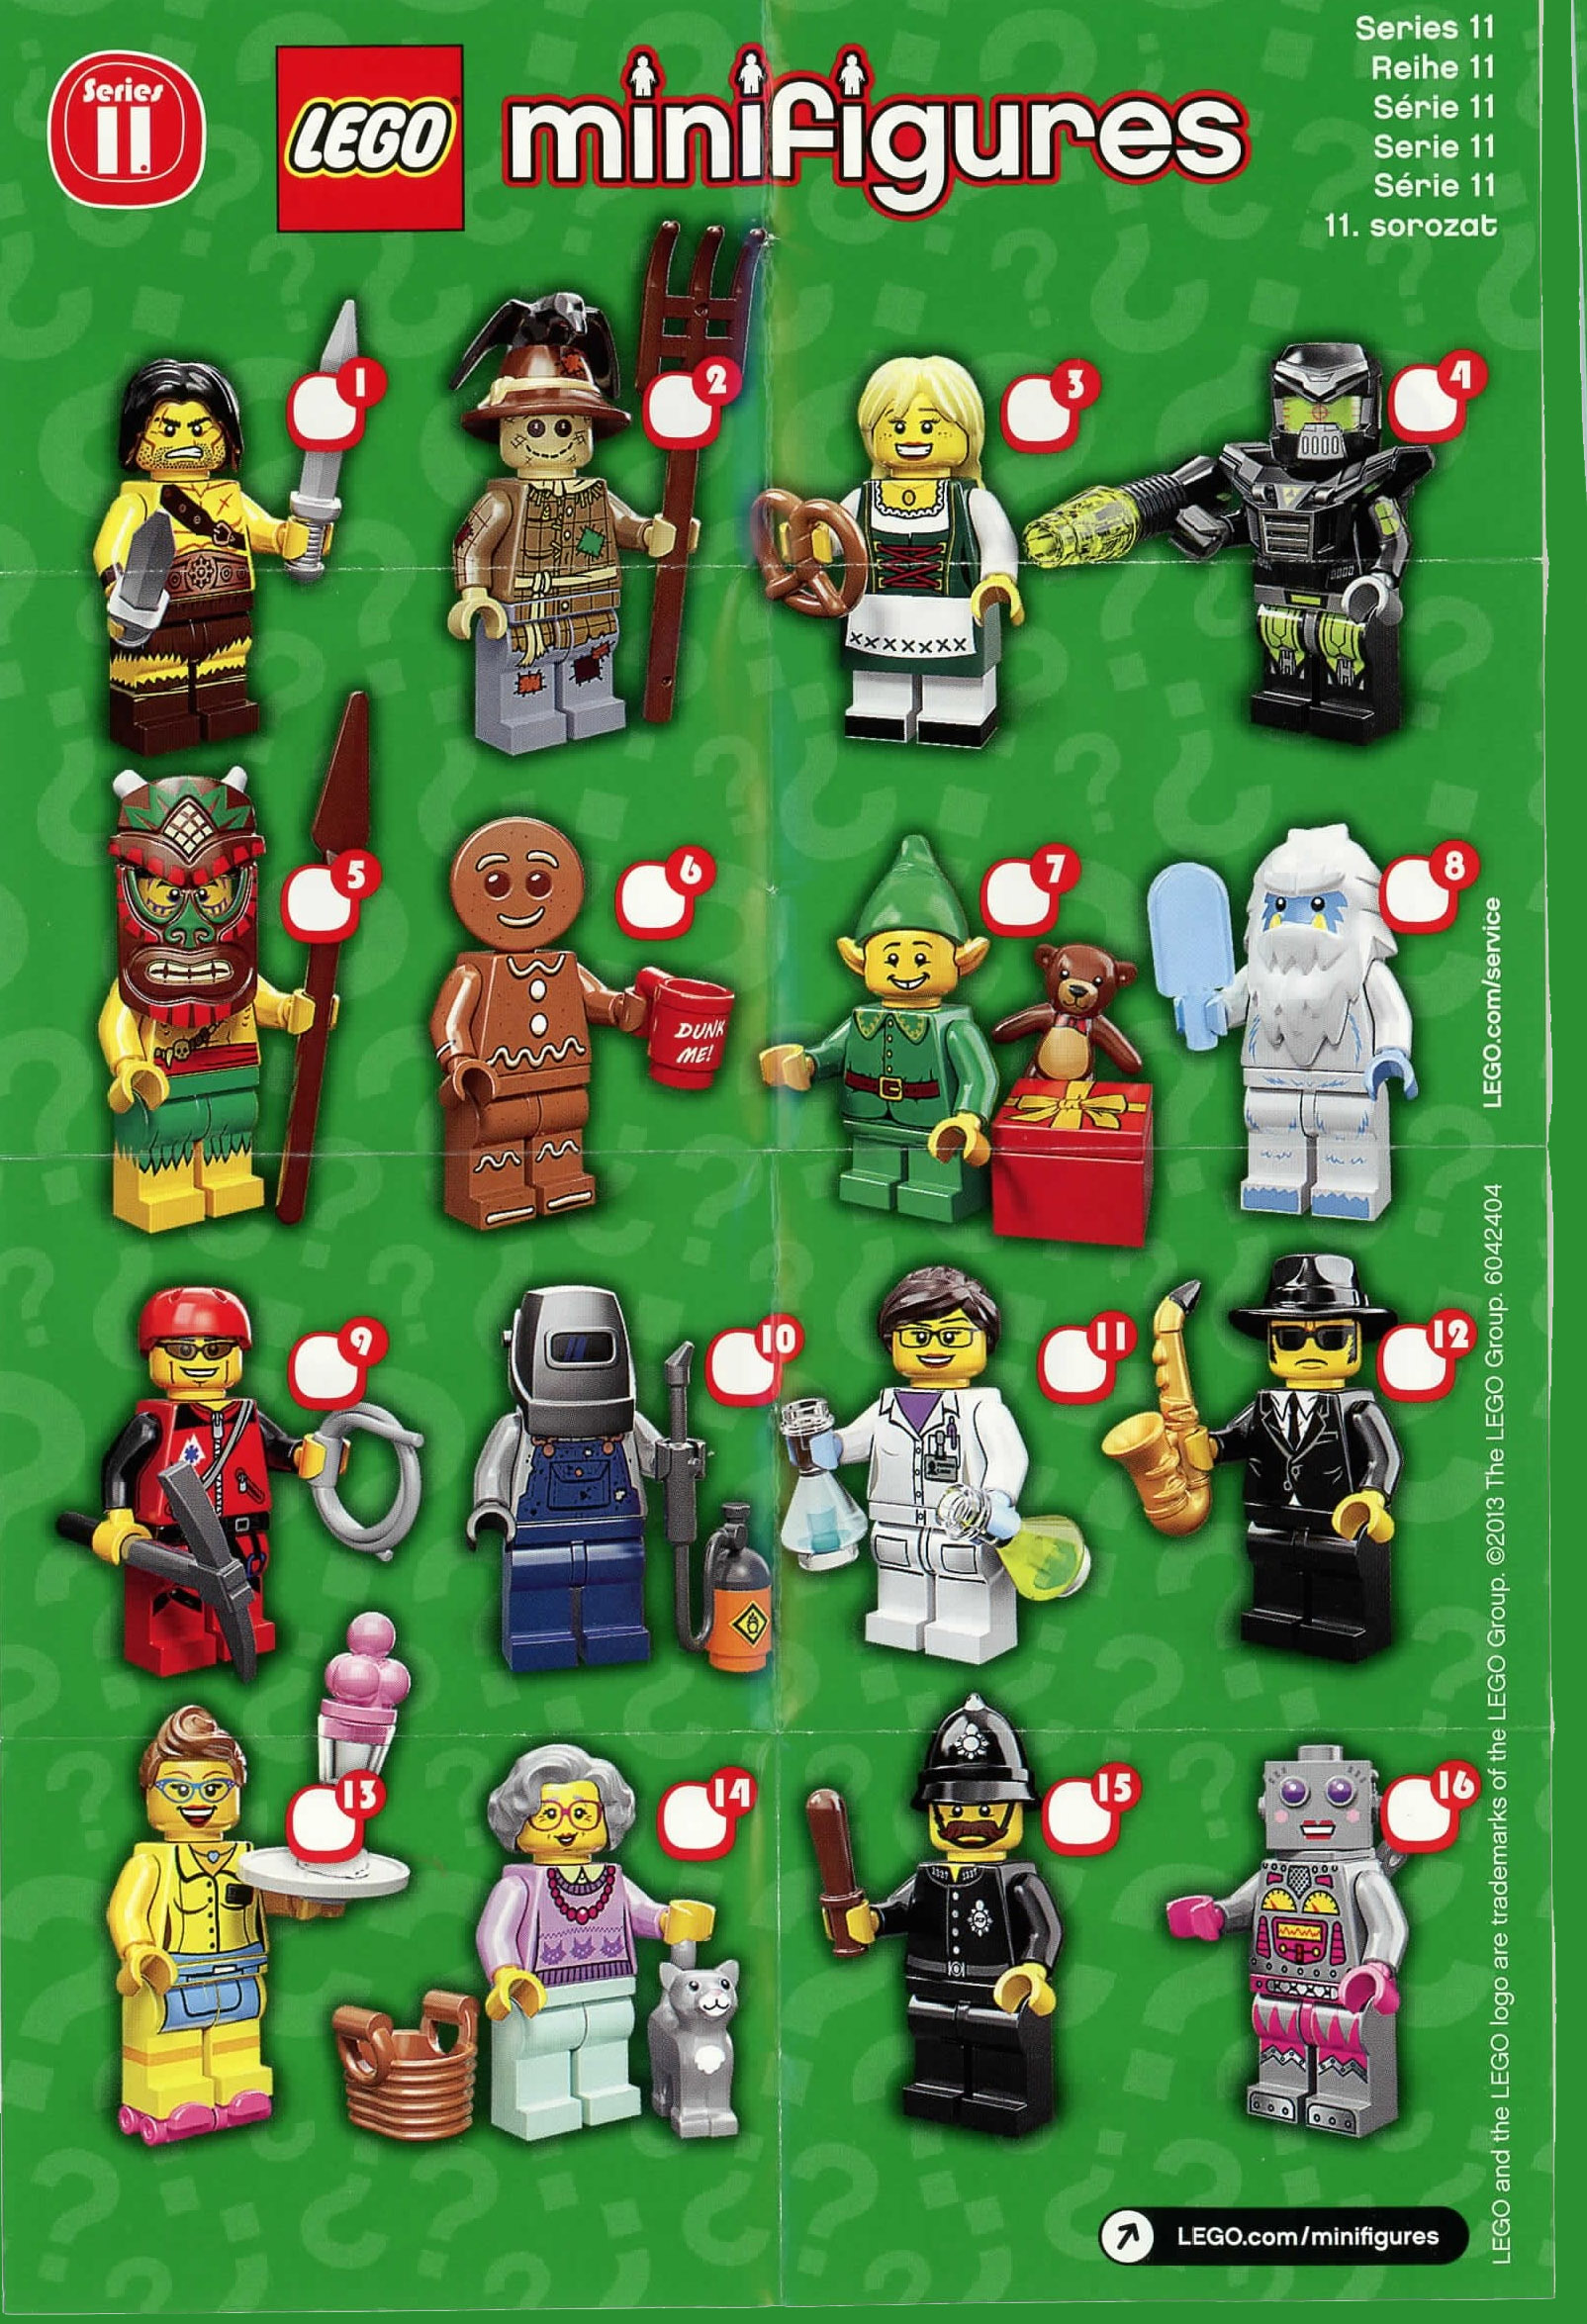 LEGO Minifigures Series 11 Figures Fully Revealed & Photos ...